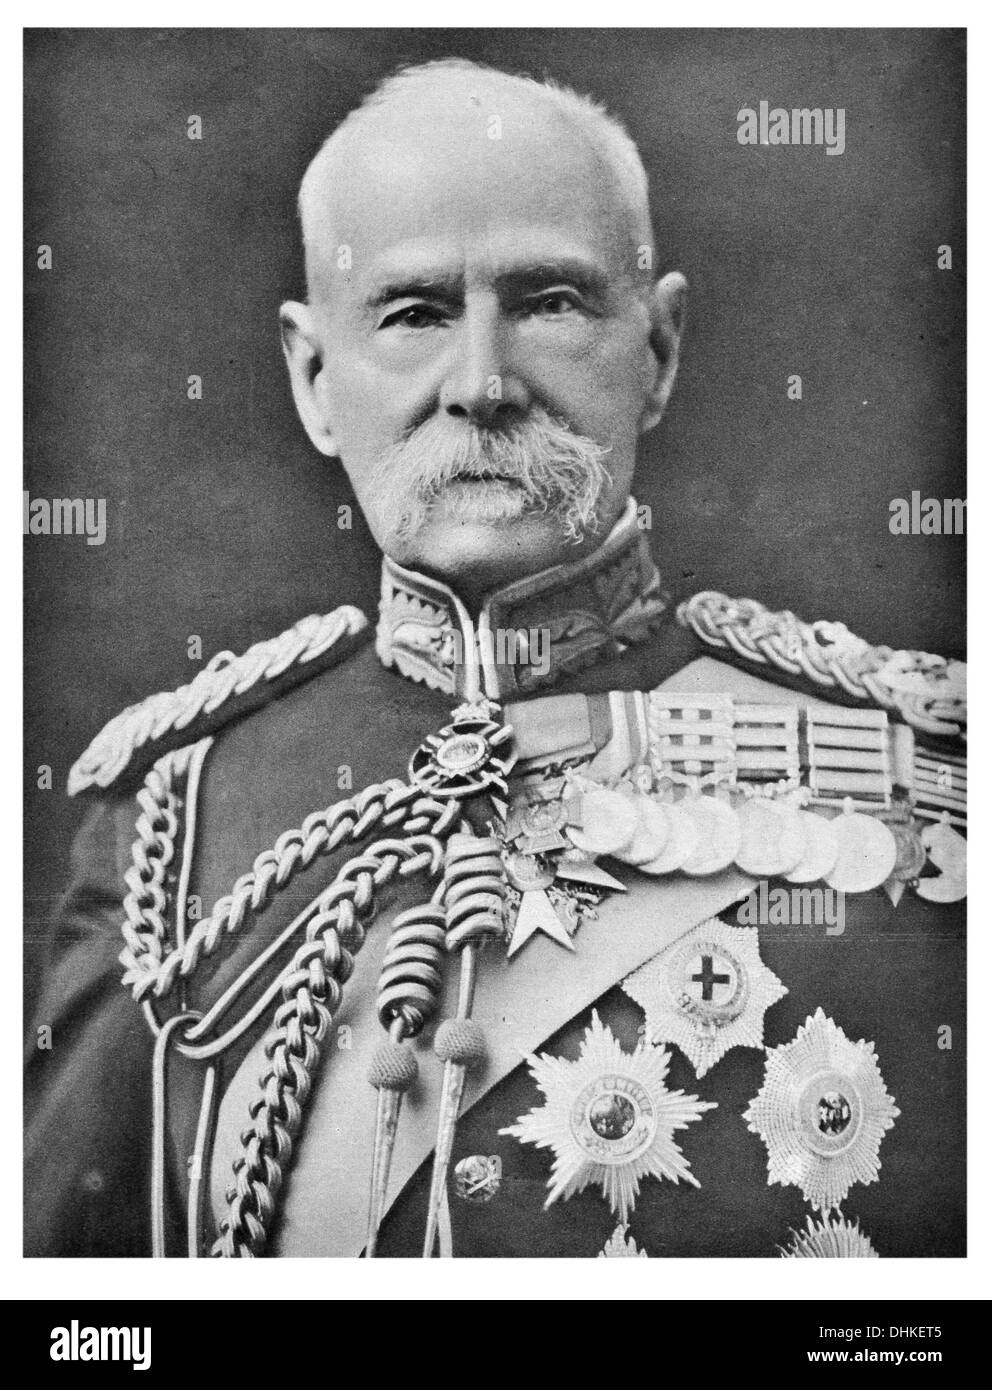 Field Marshal Frederick Sleigh Roberts, 1st Earl Roberts VC KG KP GCB OM GCSI GCIE KStJ VD PC - Stock Image